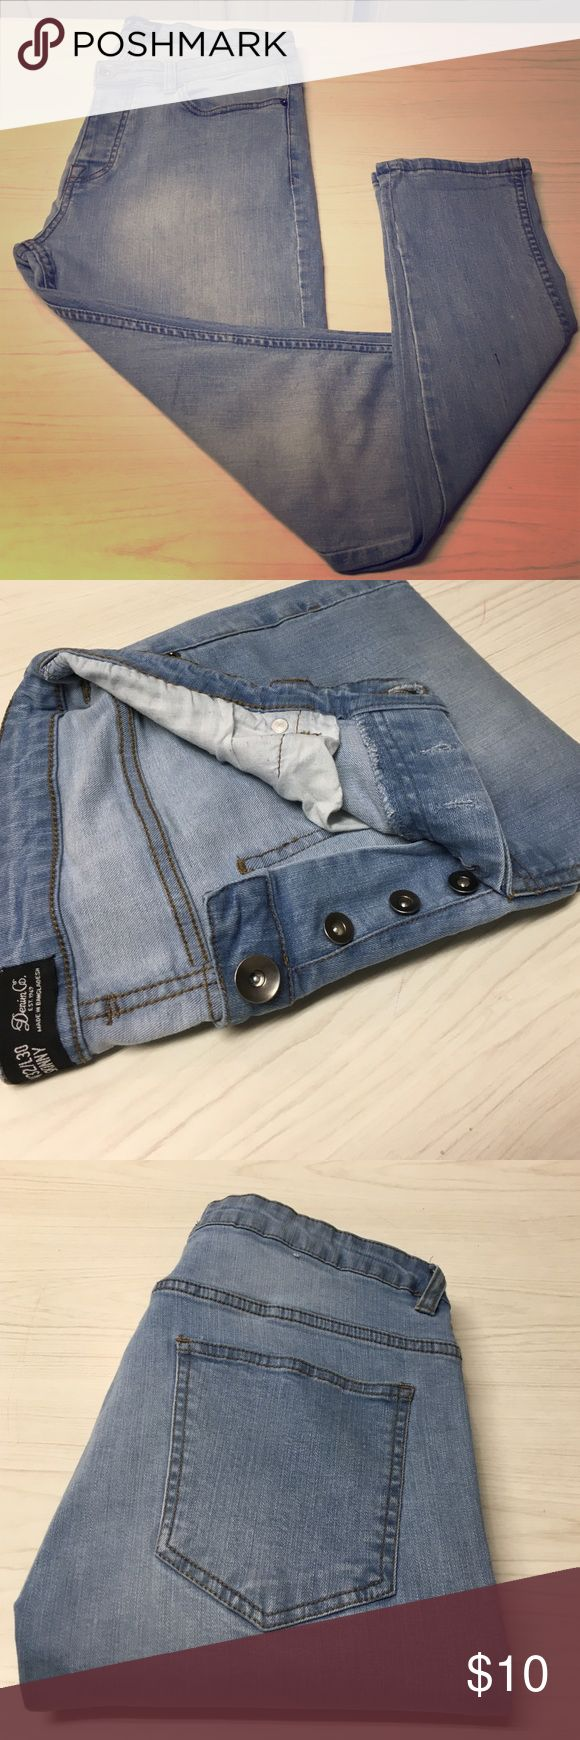 Denim Co. (Primark) Light Wash Skinny Denim Primark brand Denim Co. Skinny Fit Denim in Light Wash. Minor Wash Distressing on Thighs and a Button Fly. Primark Jeans Skinny